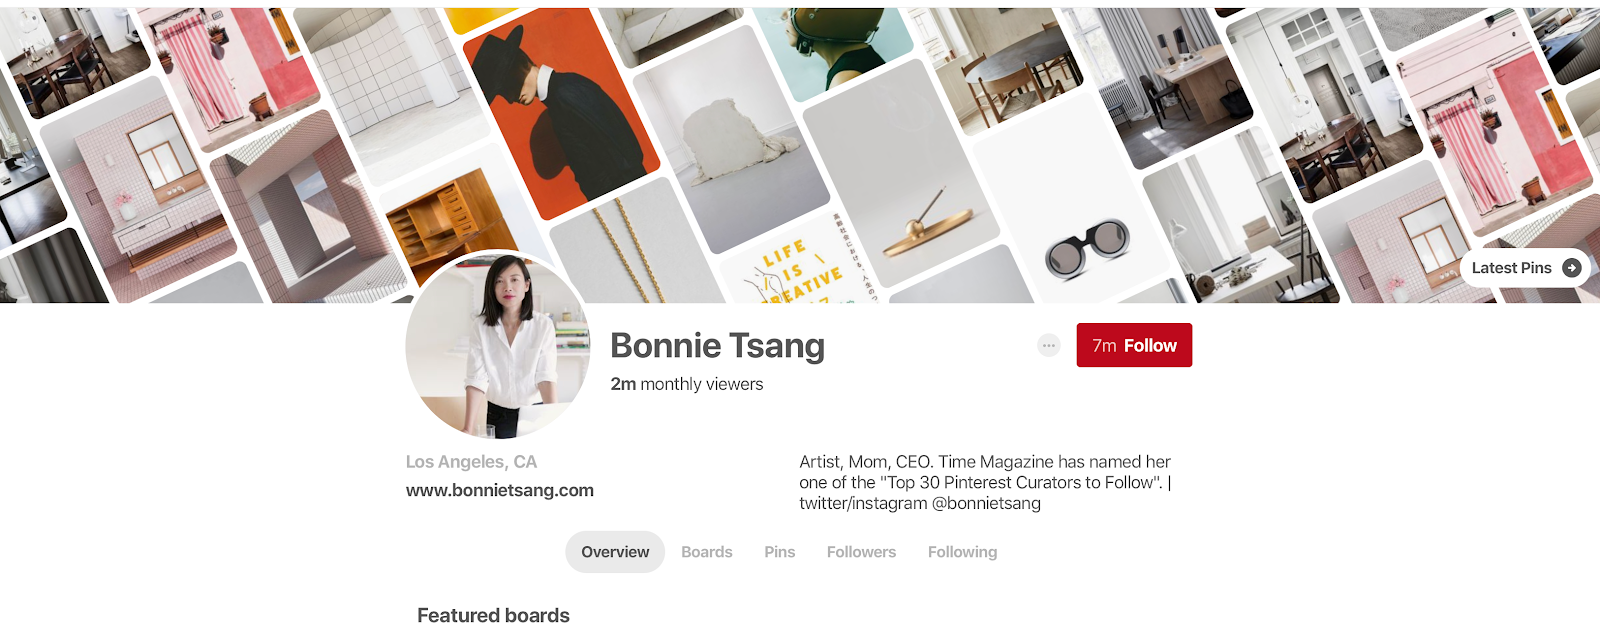 Bonnie Tsang's Pinterest profile